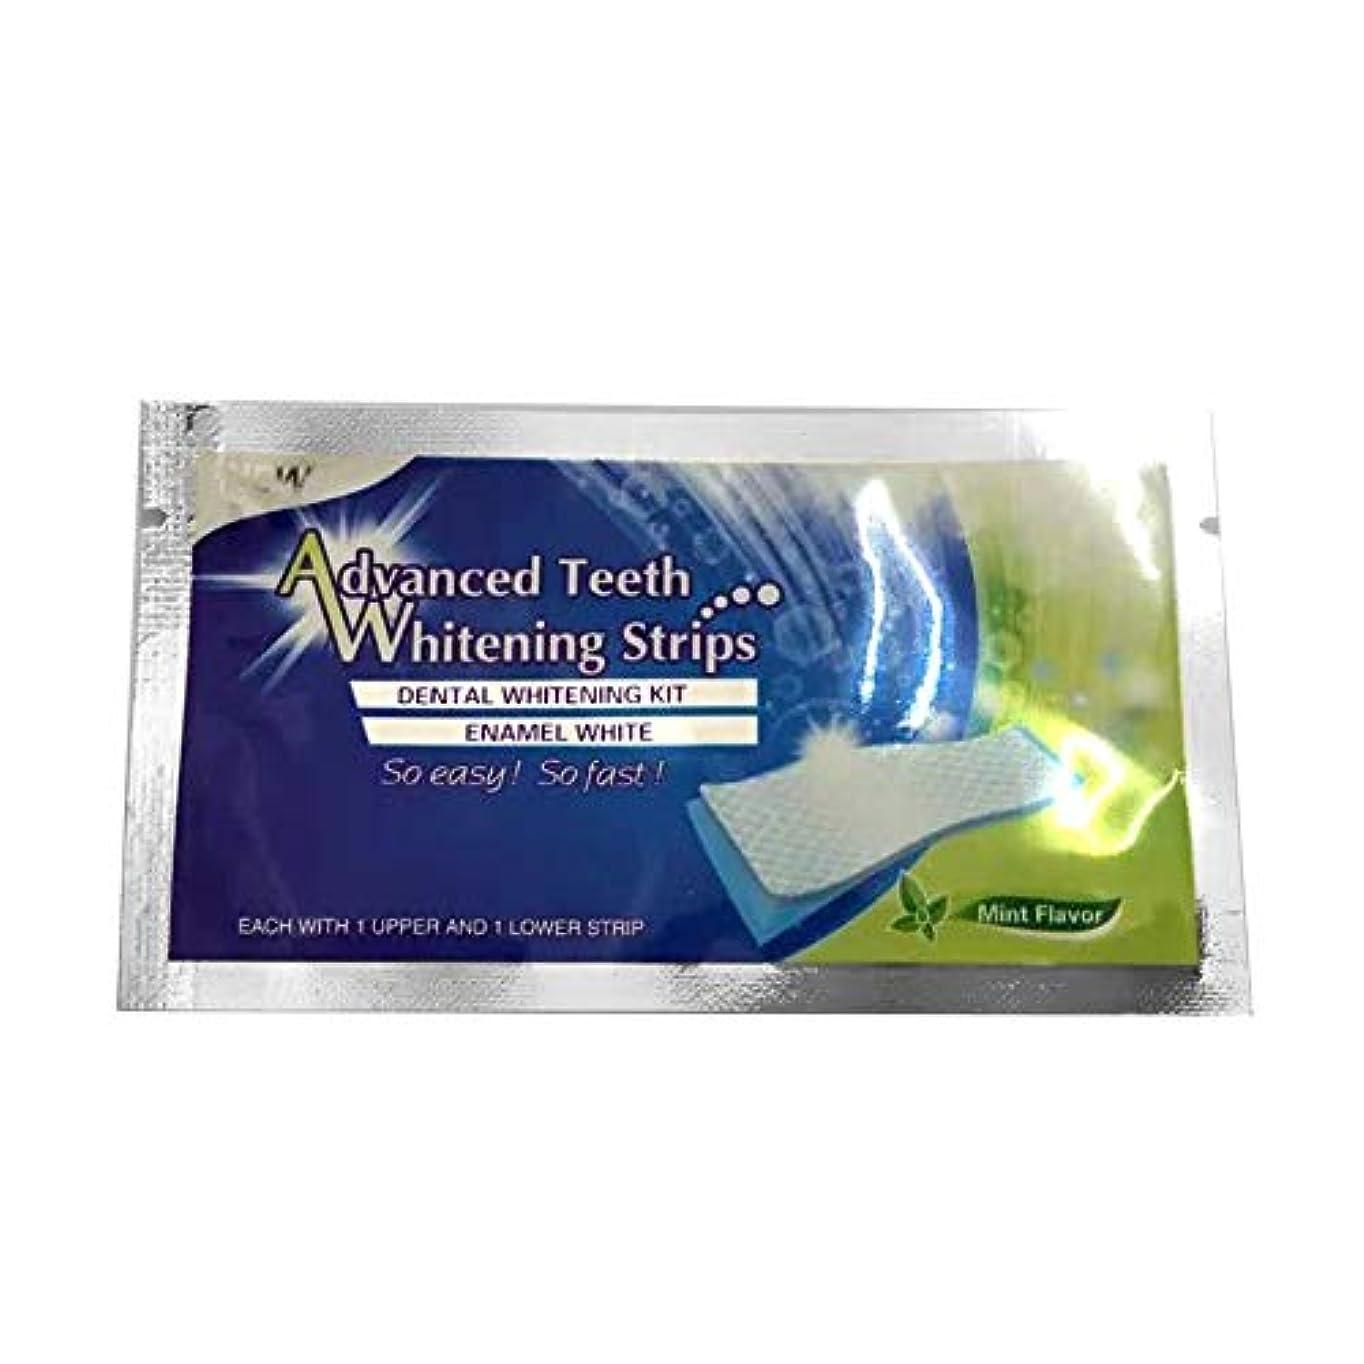 AAcreatspaceテープ歯のホワイトニングストリップホワイトテープ歯のホワイトニング職業ホワイトニング高度な漂白テープ (1pcs)